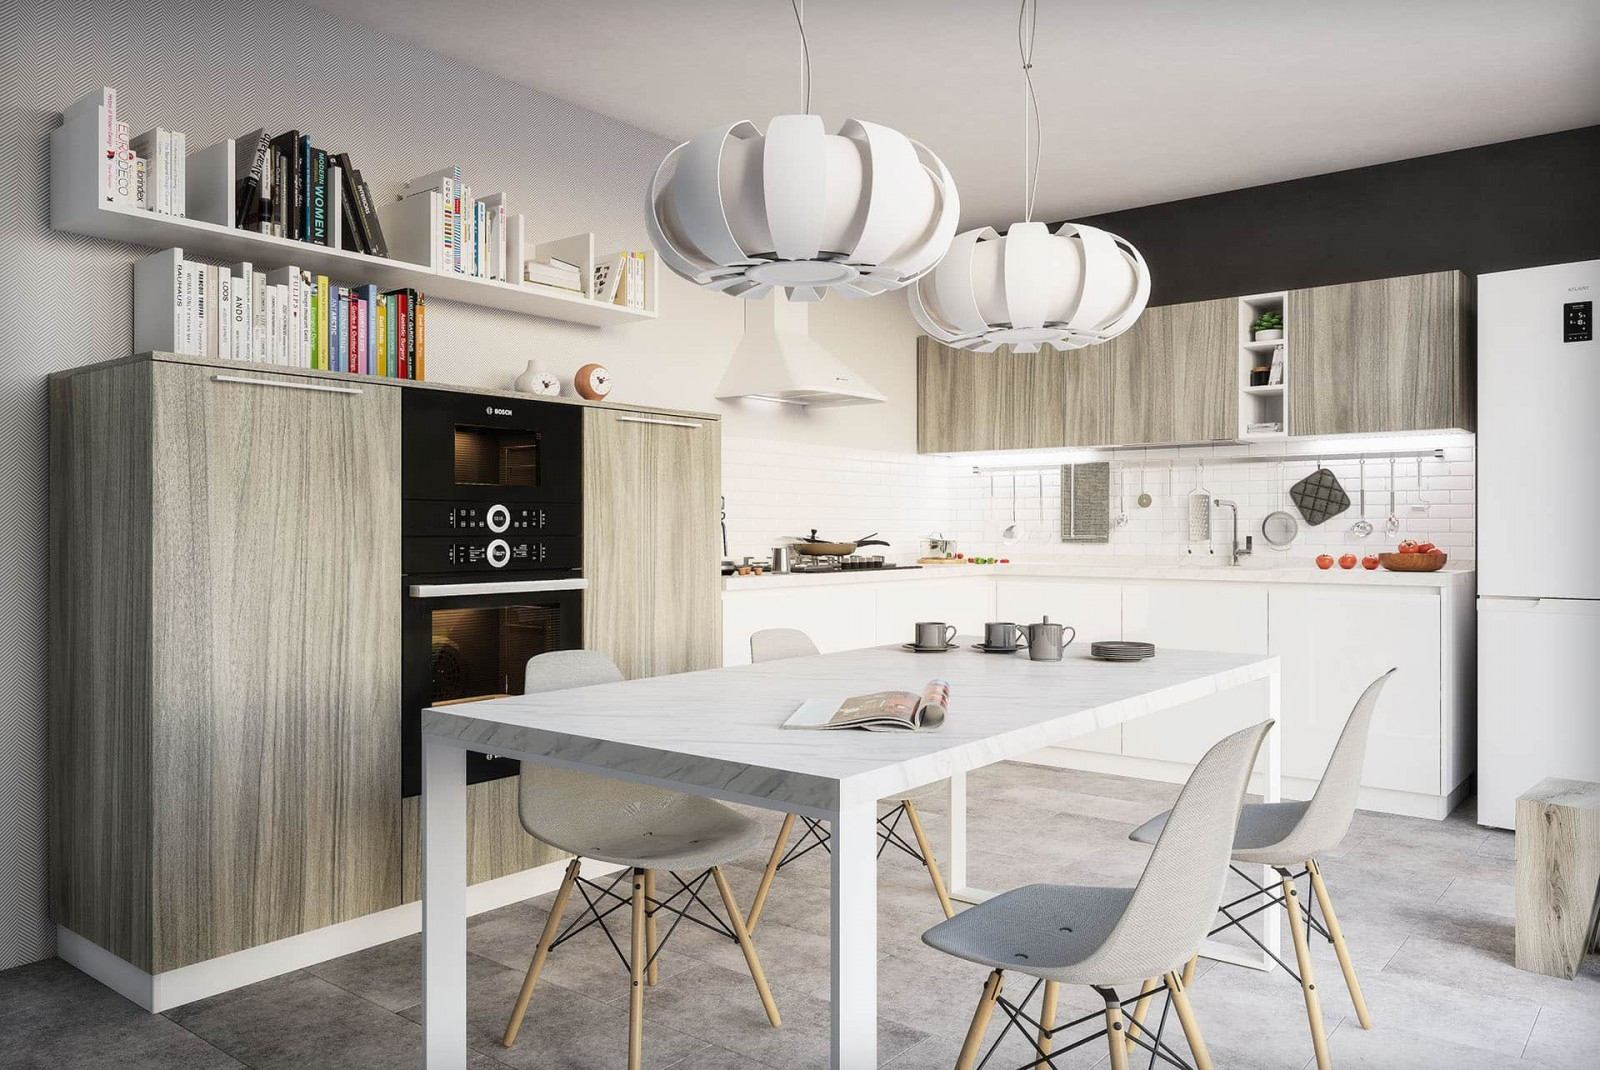 küche grau landhaus küchenmöbel grau